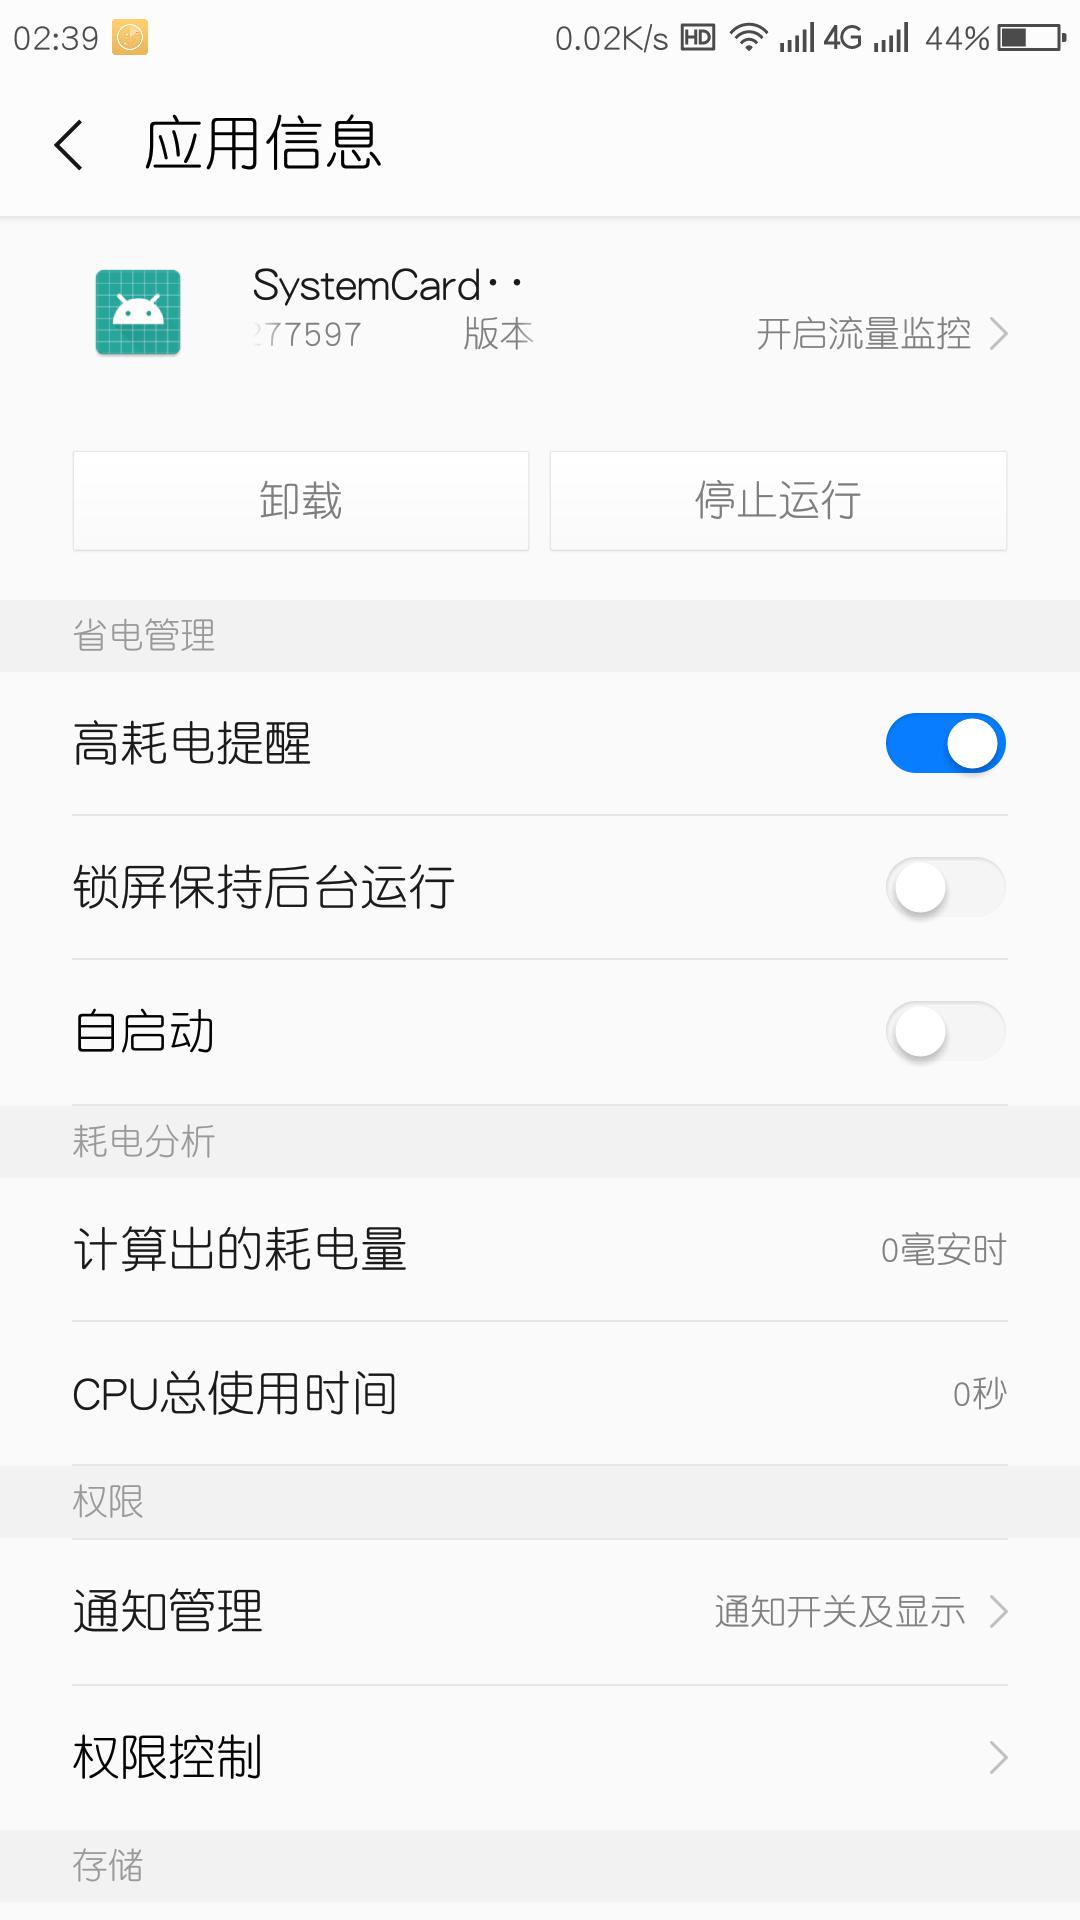 Screenshot_2019-01-22-02-39-15.png